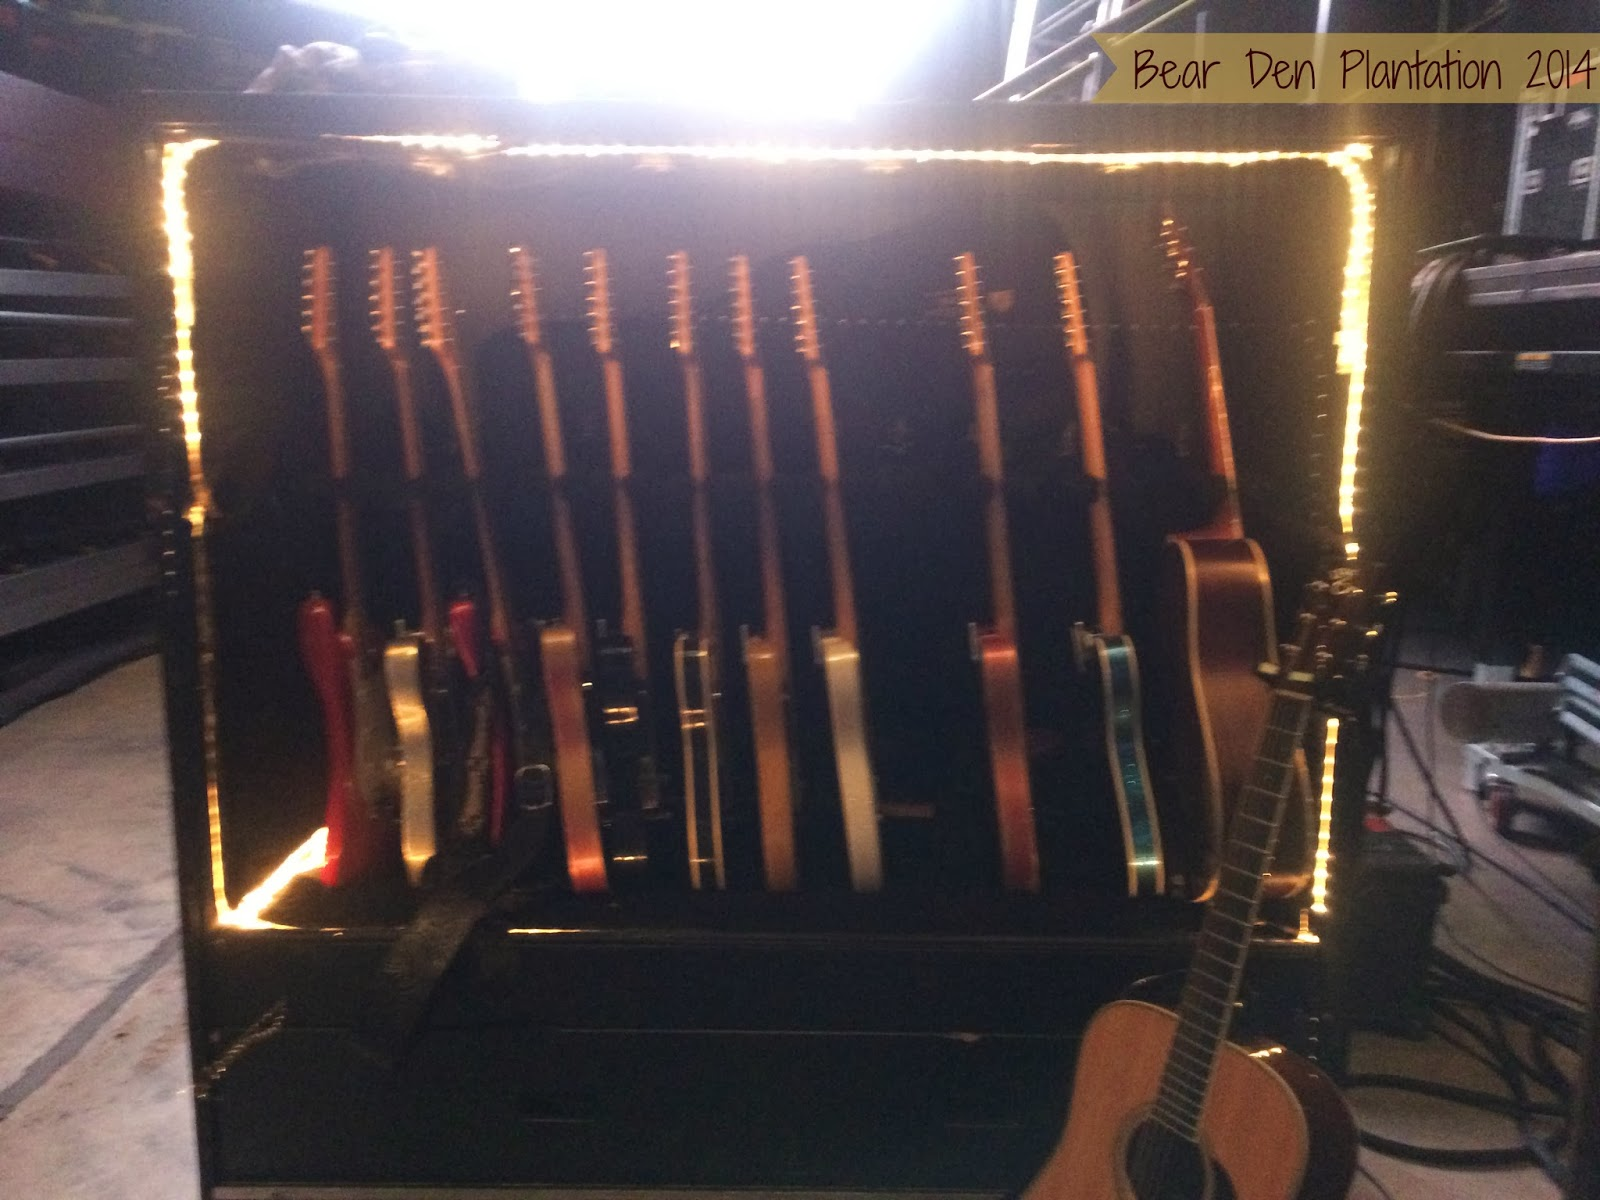 Brad Paisley's Guitars